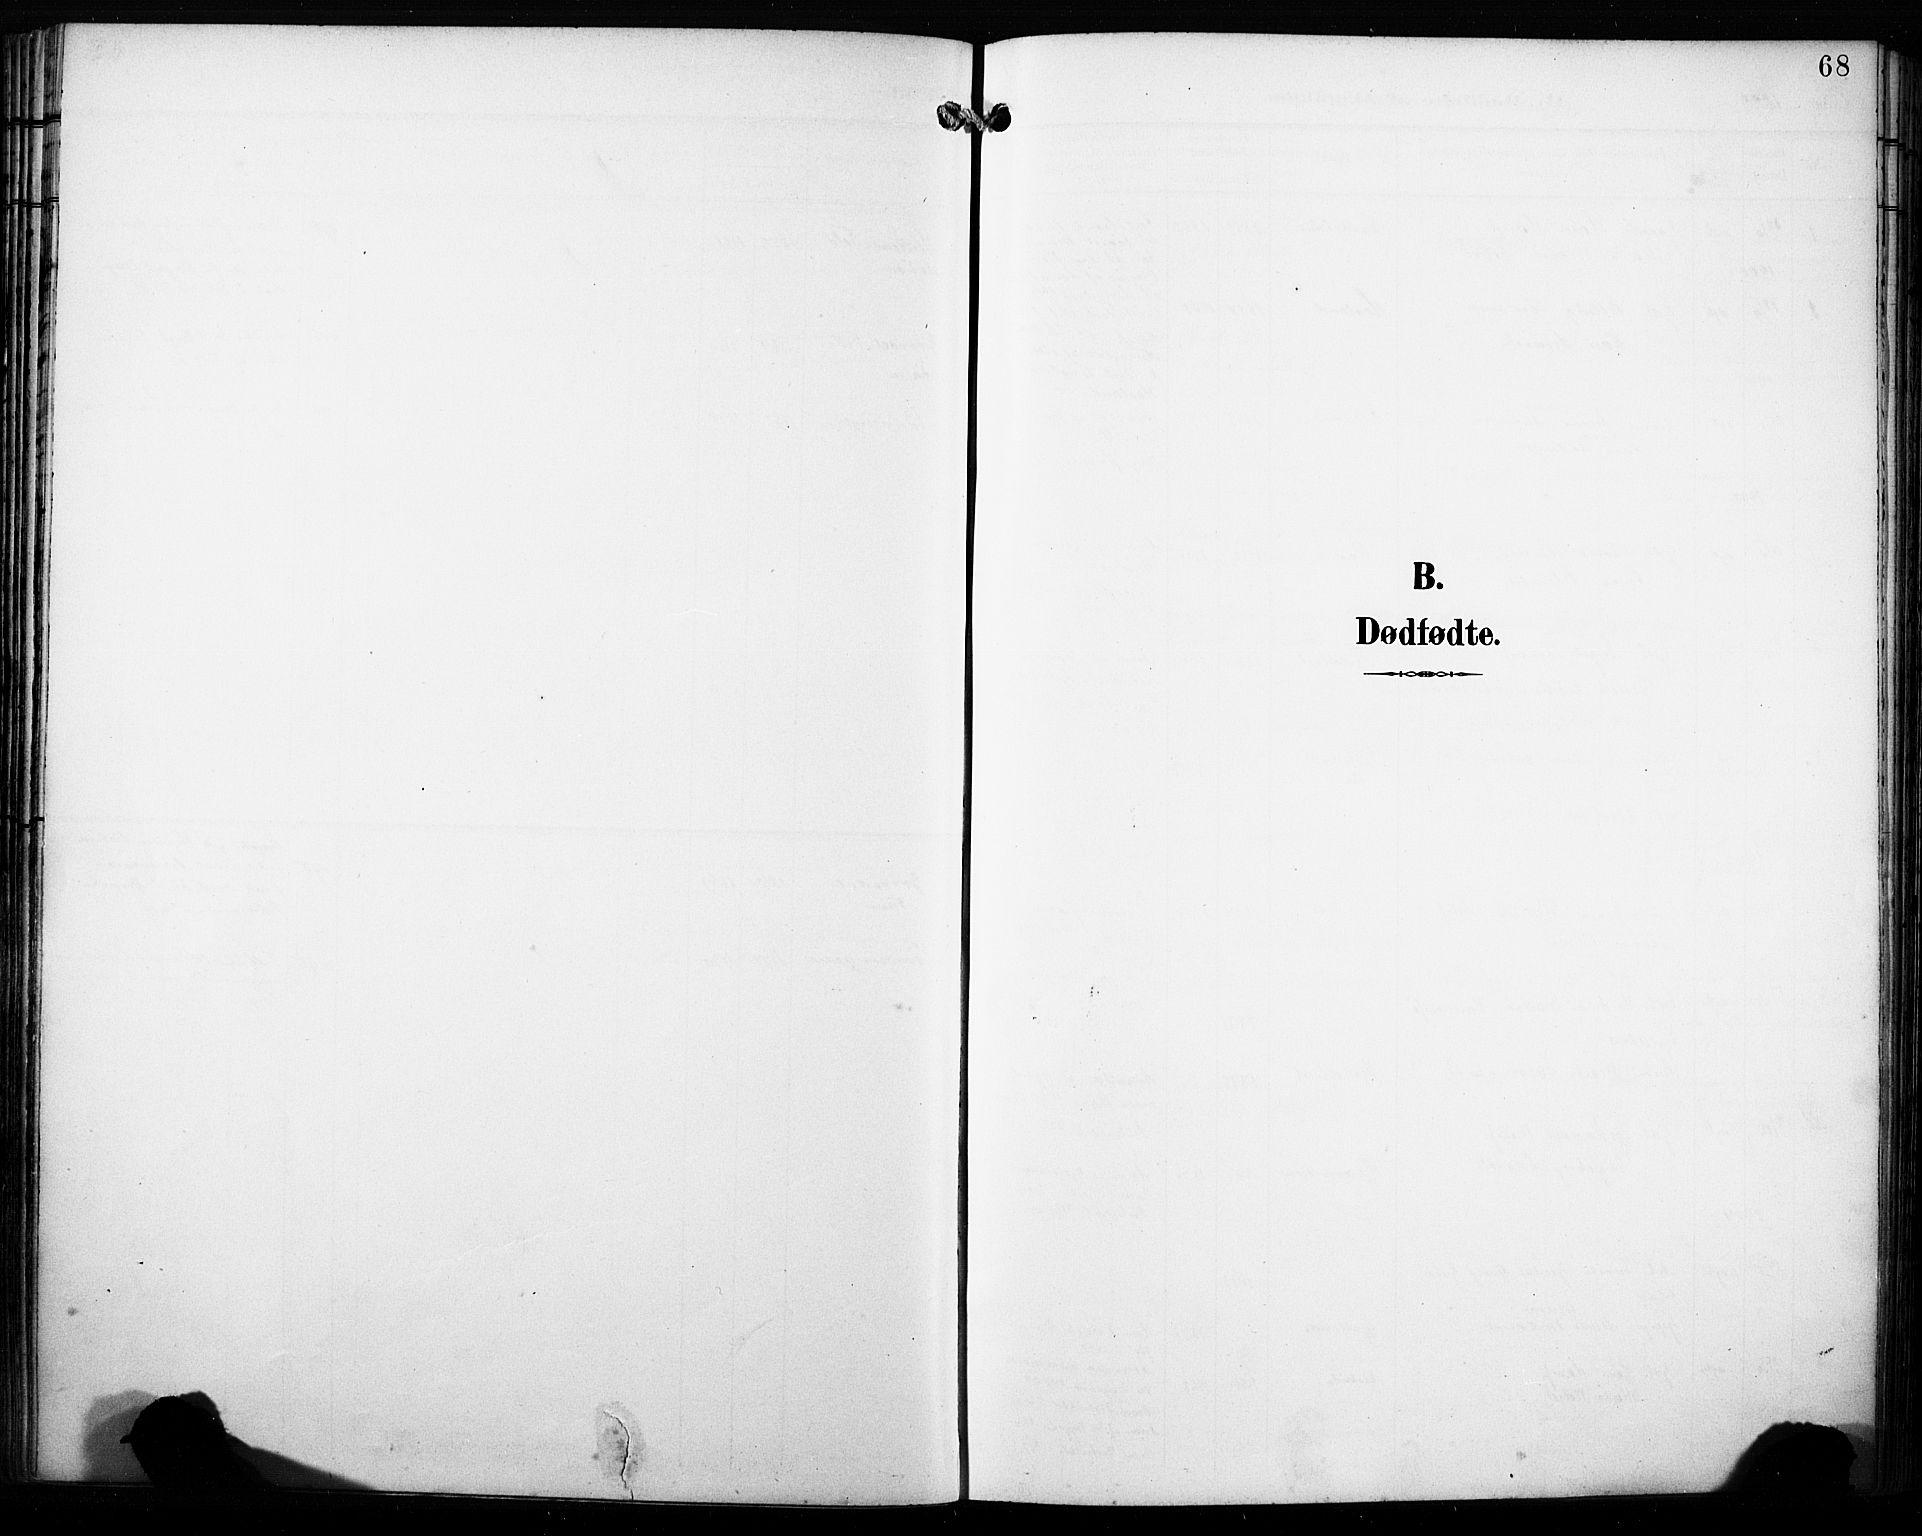 SAB, Fana Sokneprestembete, H/Haa/Haab/L0003: Ministerialbok nr. B 3, 1898-1907, s. 68